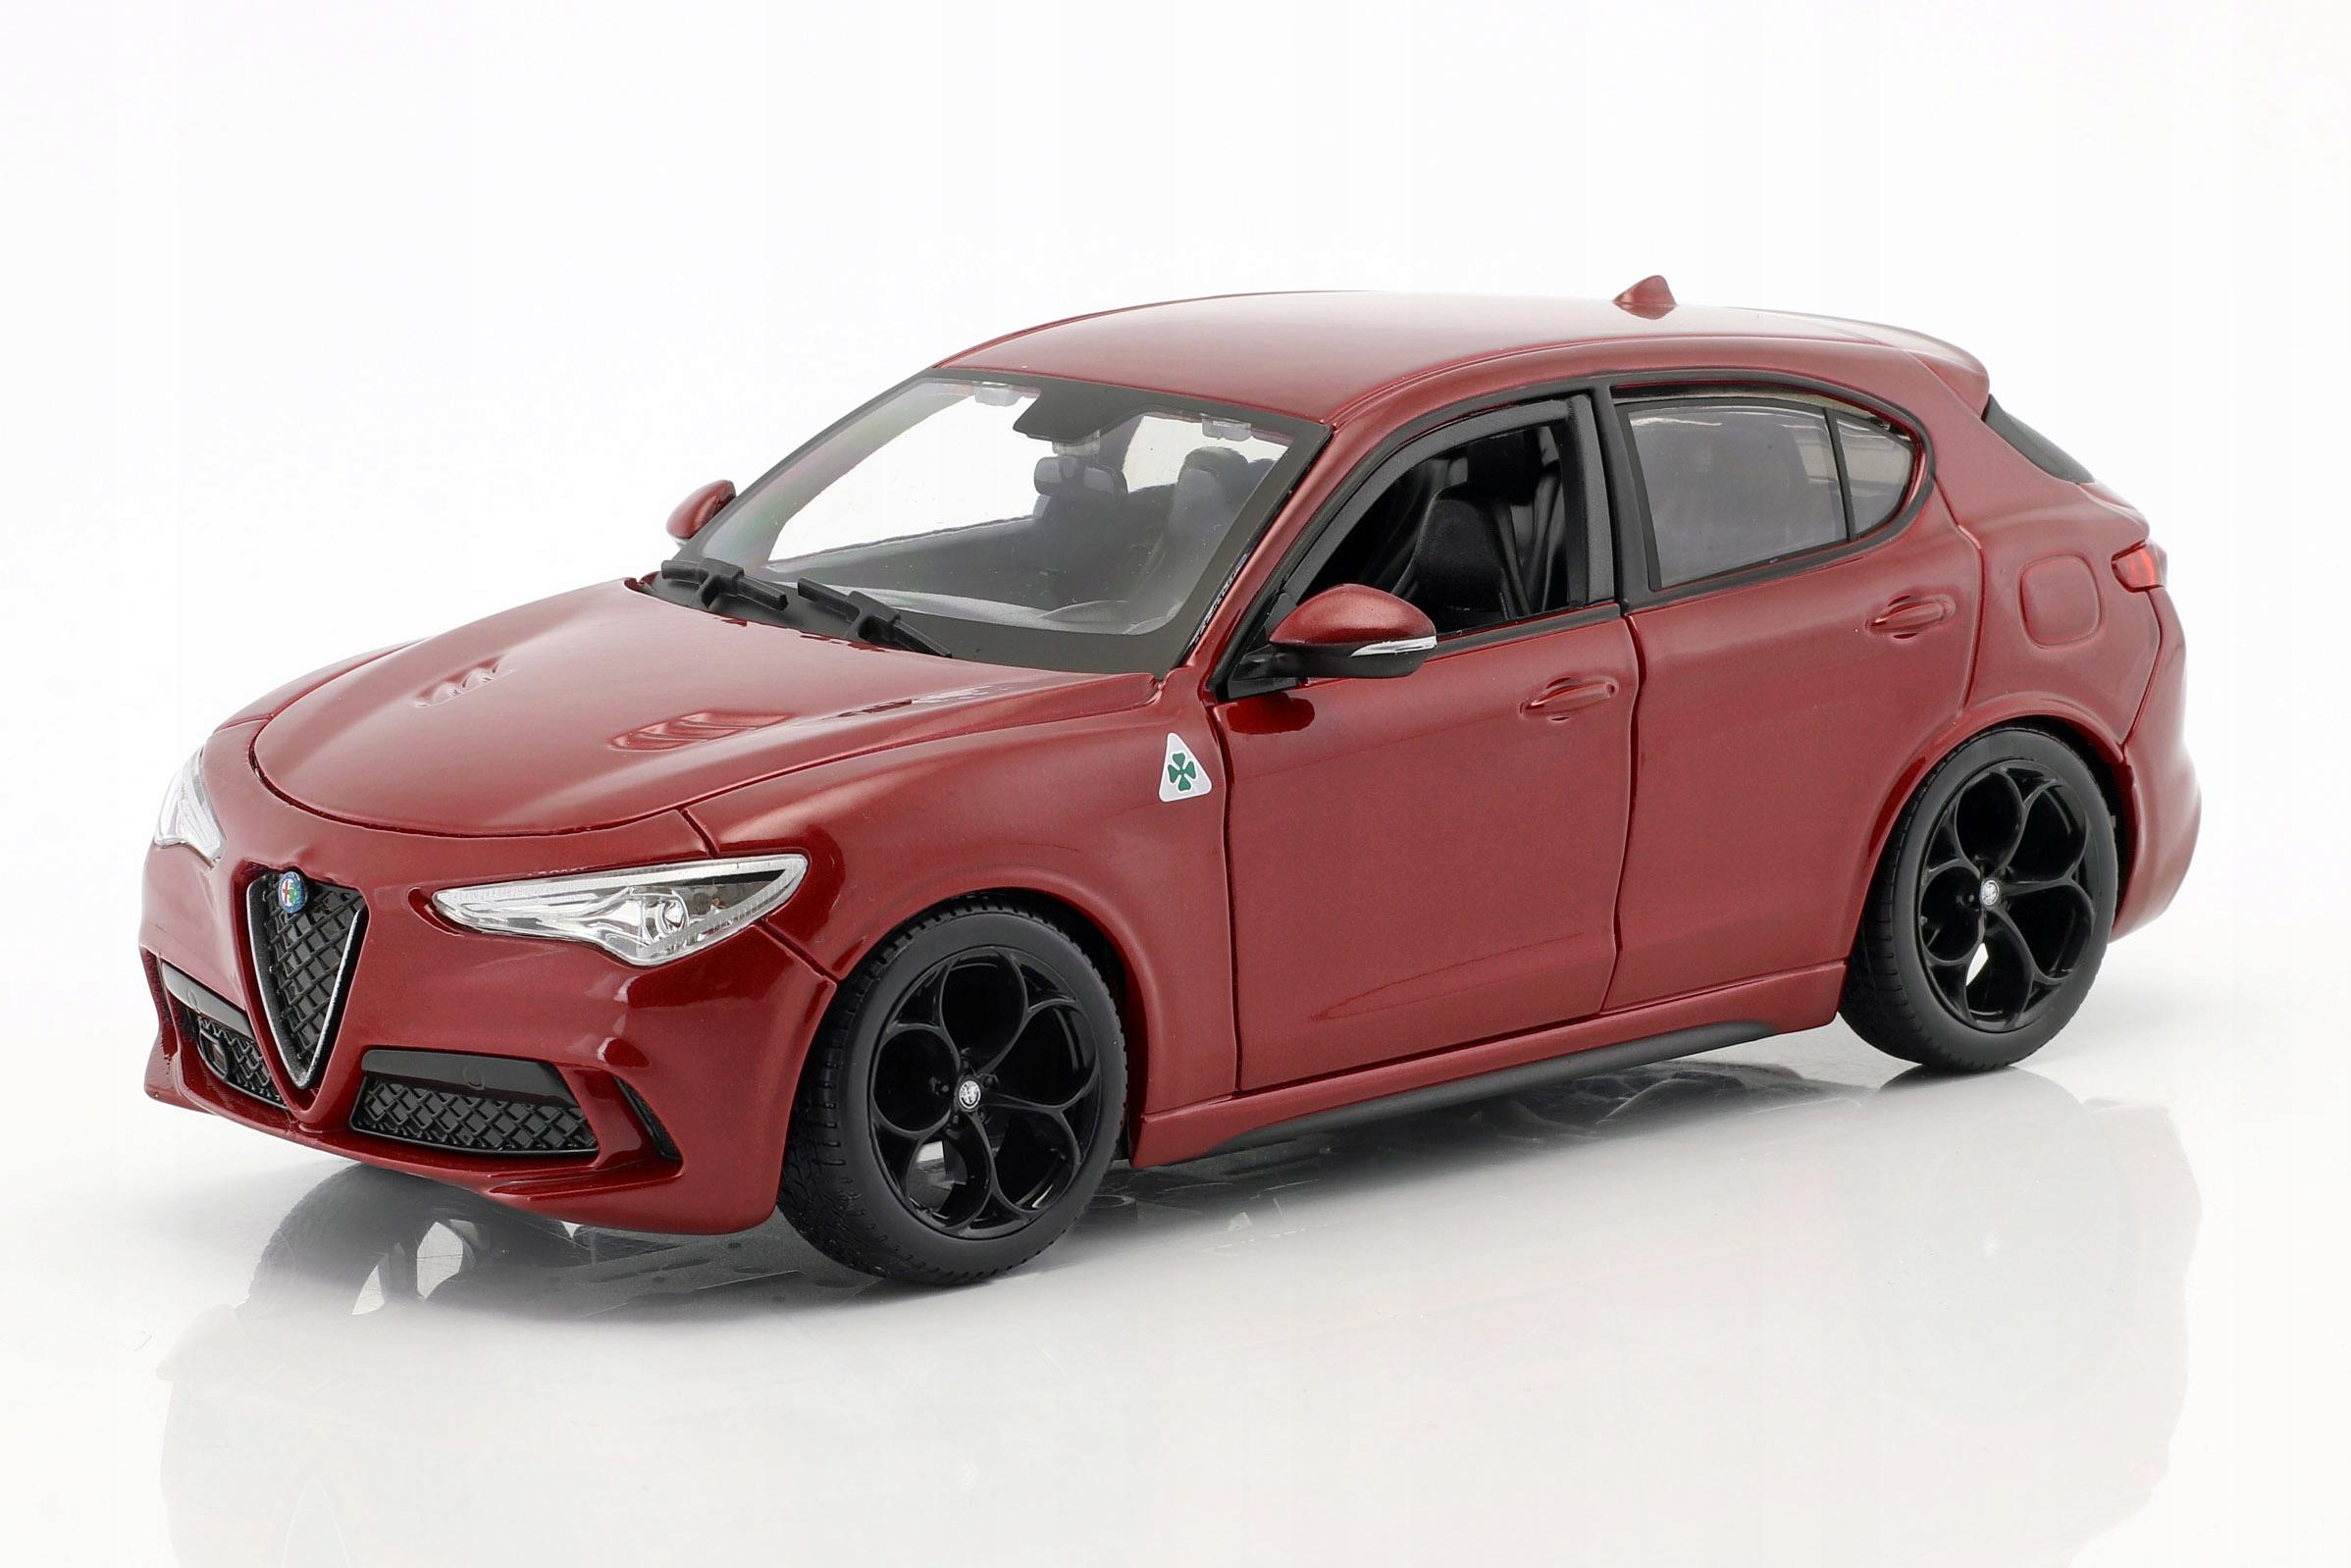 Alfa Romeo Stelvio 2017 Bburago 1 24 21086 Nowosc 7694491793 Allegro Pl